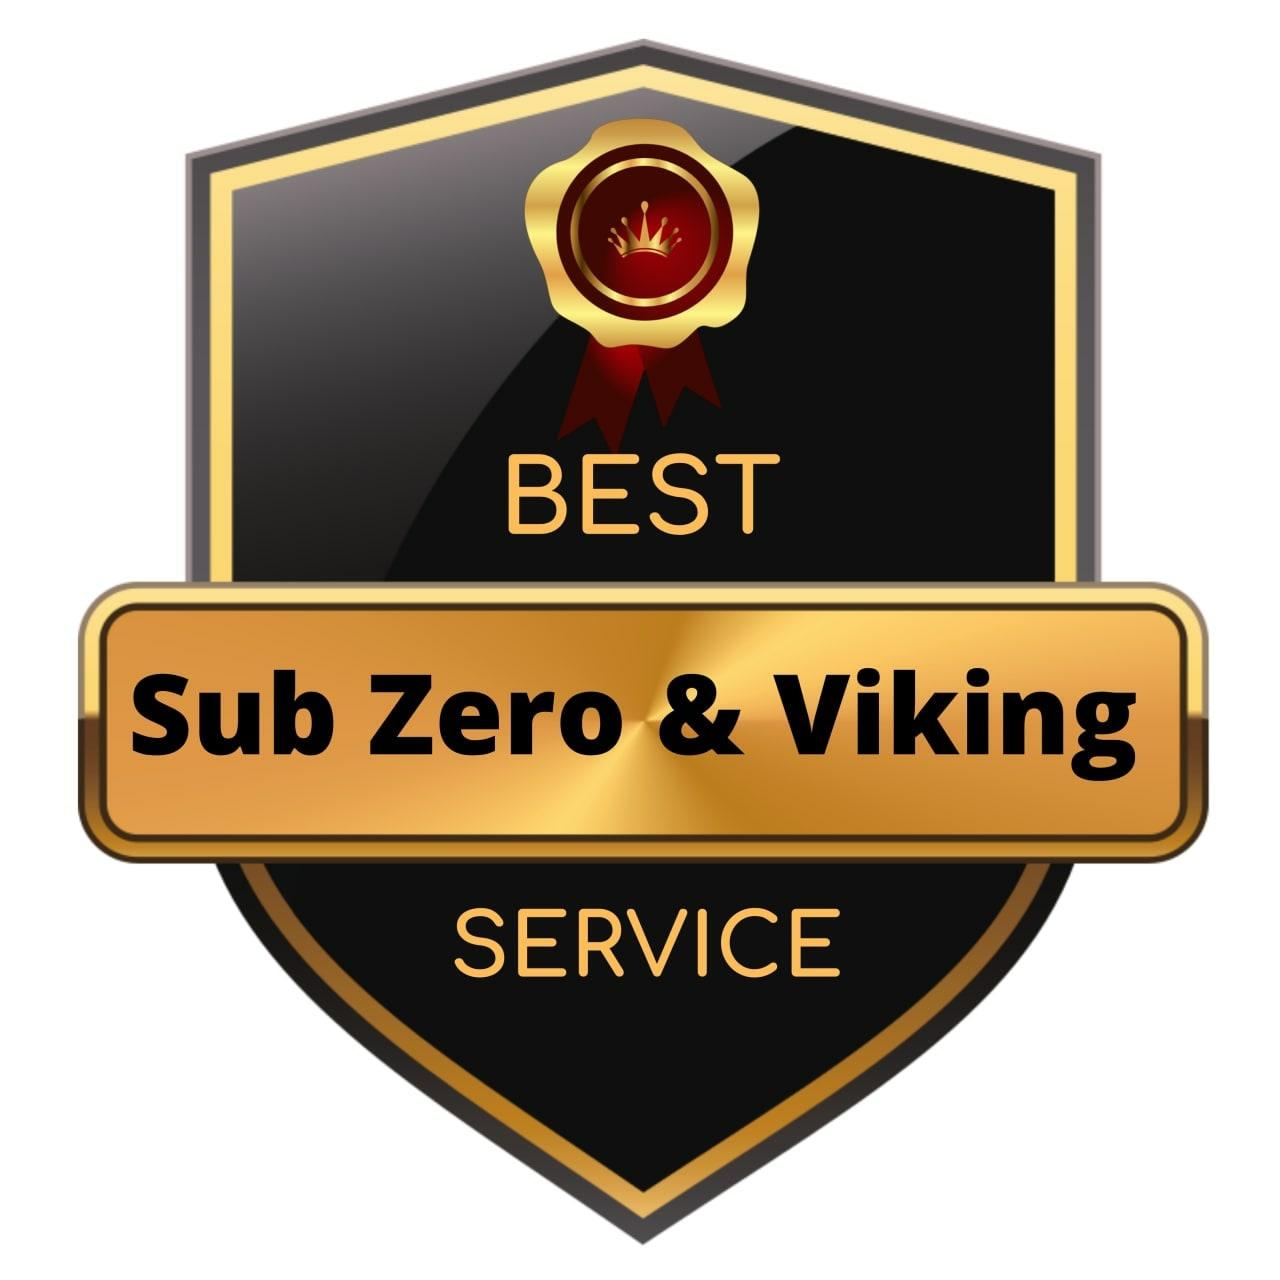 BEST SUB ZERO & VIKING SERVICE logo